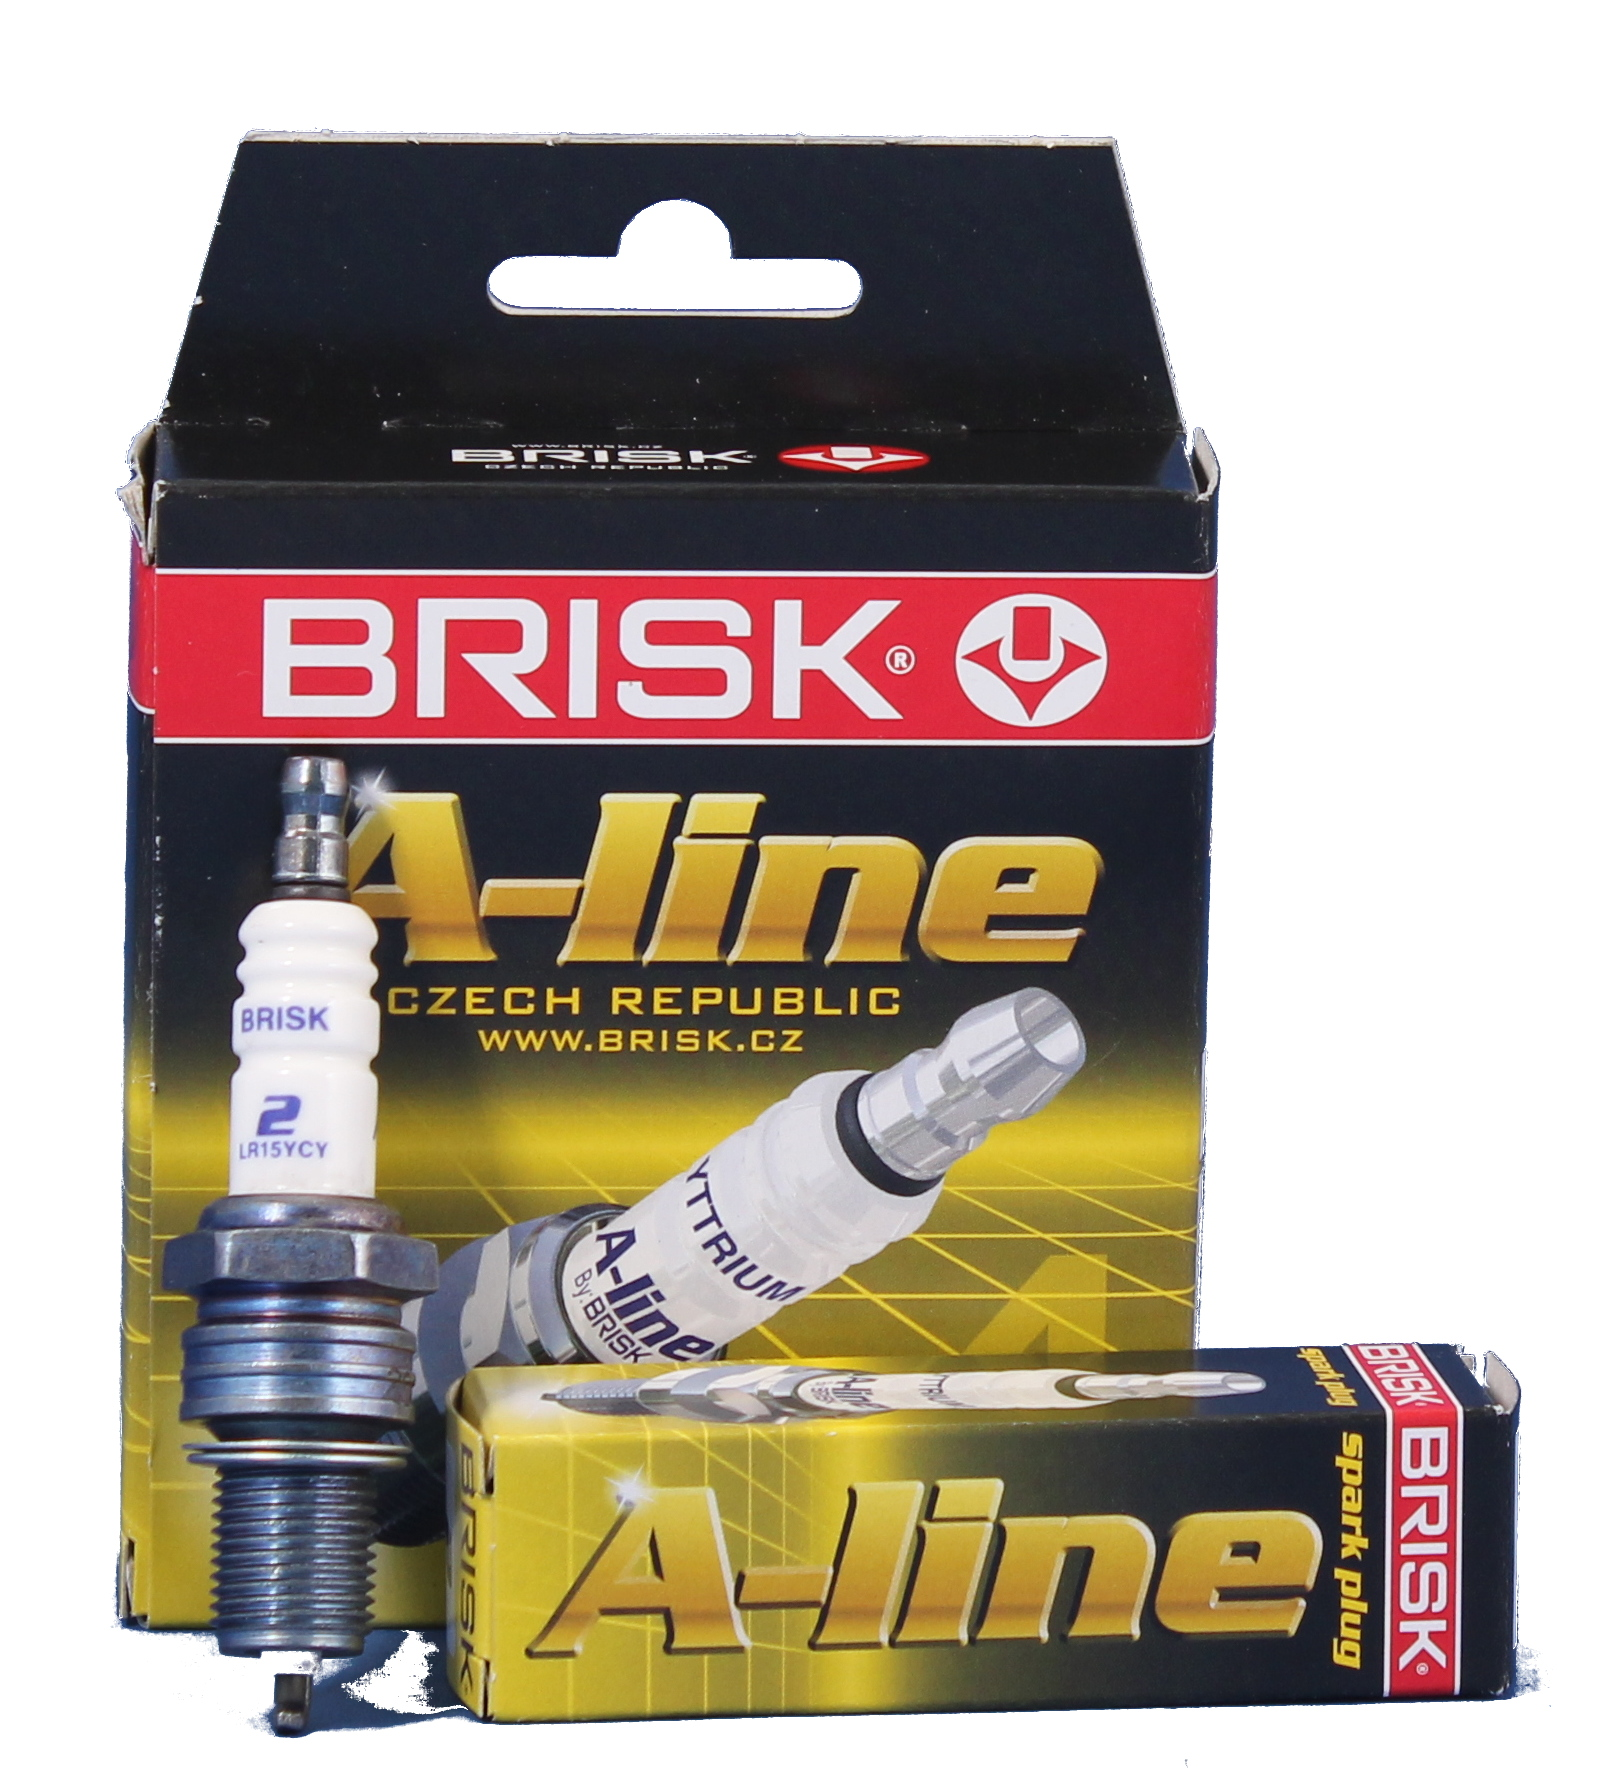 BRISK A-Line02 Свеча зажиг ВАЗ 2108-99 (к-т 4шт.)